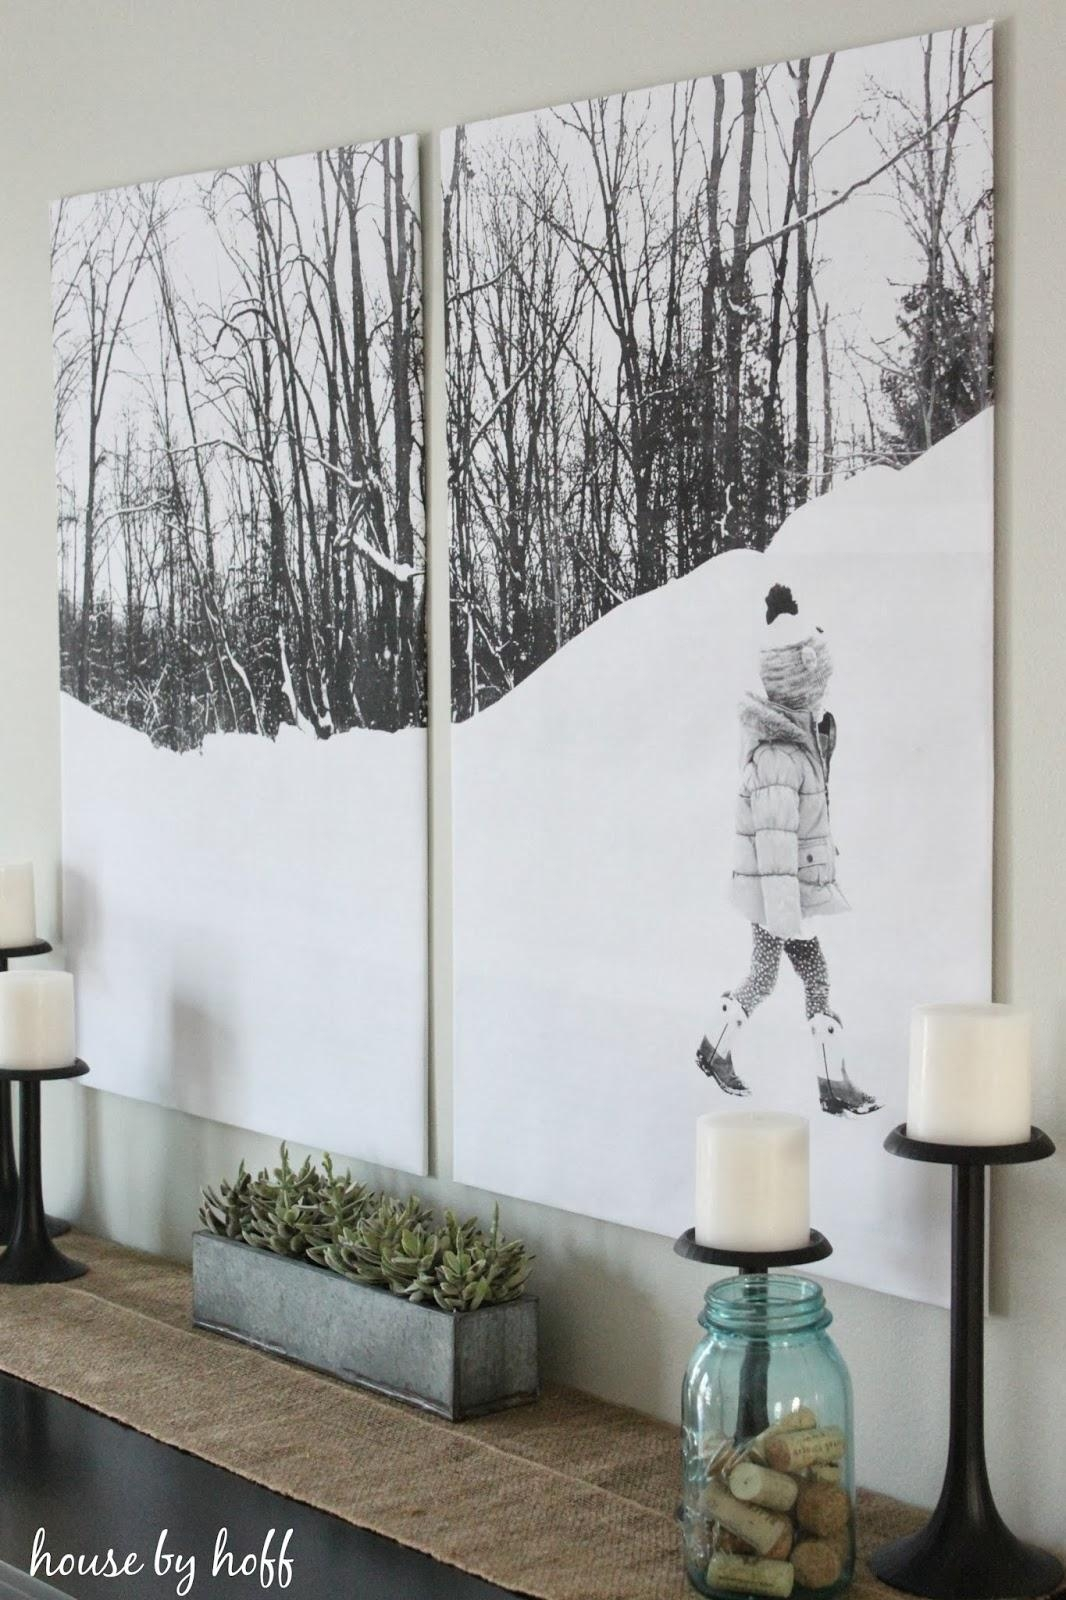 Remodelaholic | 60 Budget-Friendly Diy Large Wall Decor Ideas regarding Large White Wall Art